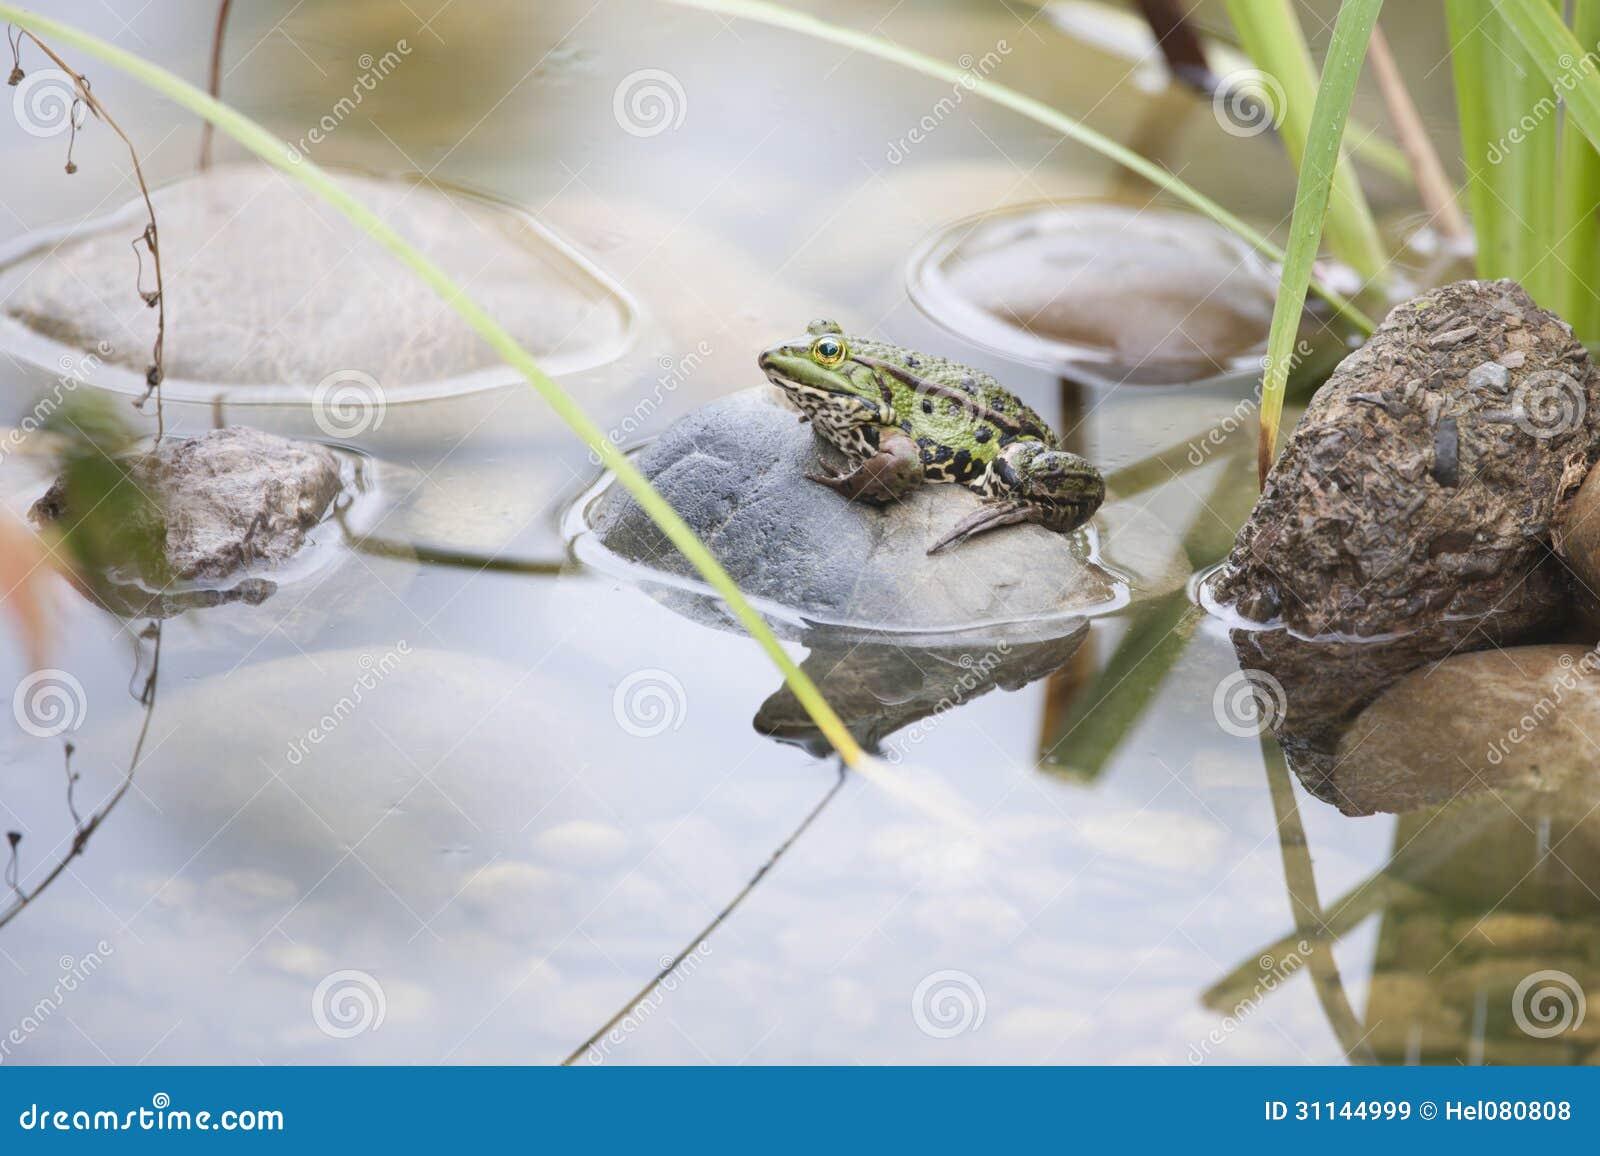 Frog in pond royalty free stock images image 31144999 for Garden pond design software free download